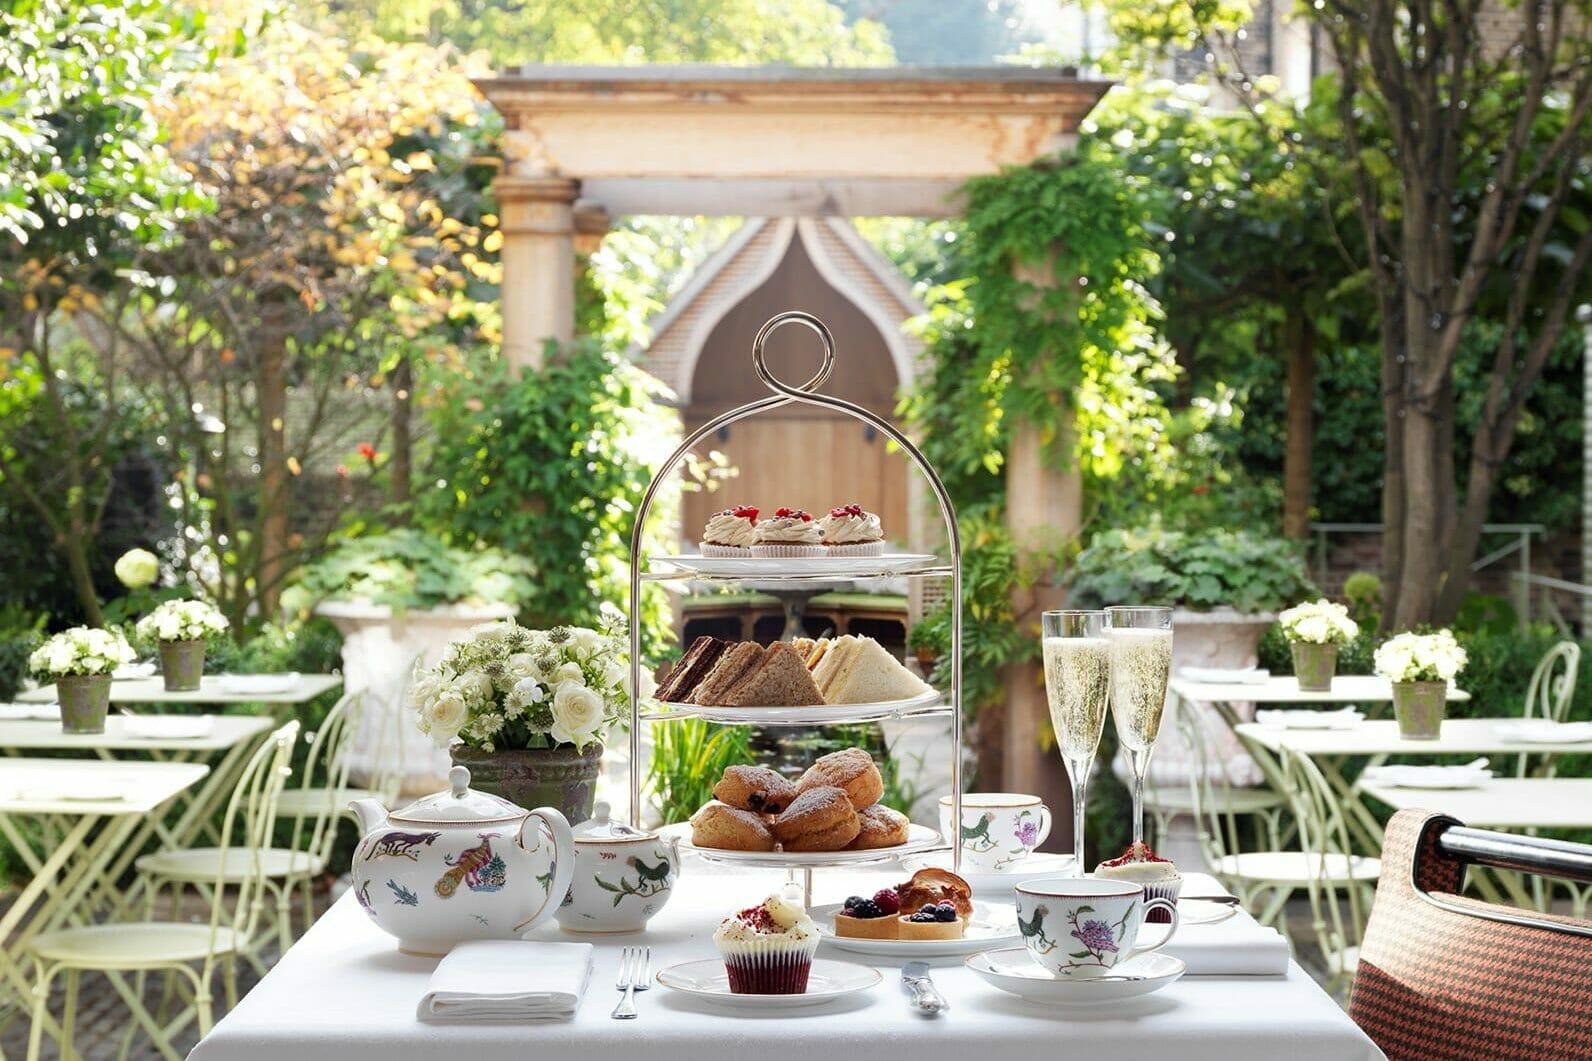 Number 16 Afternoon Tea London